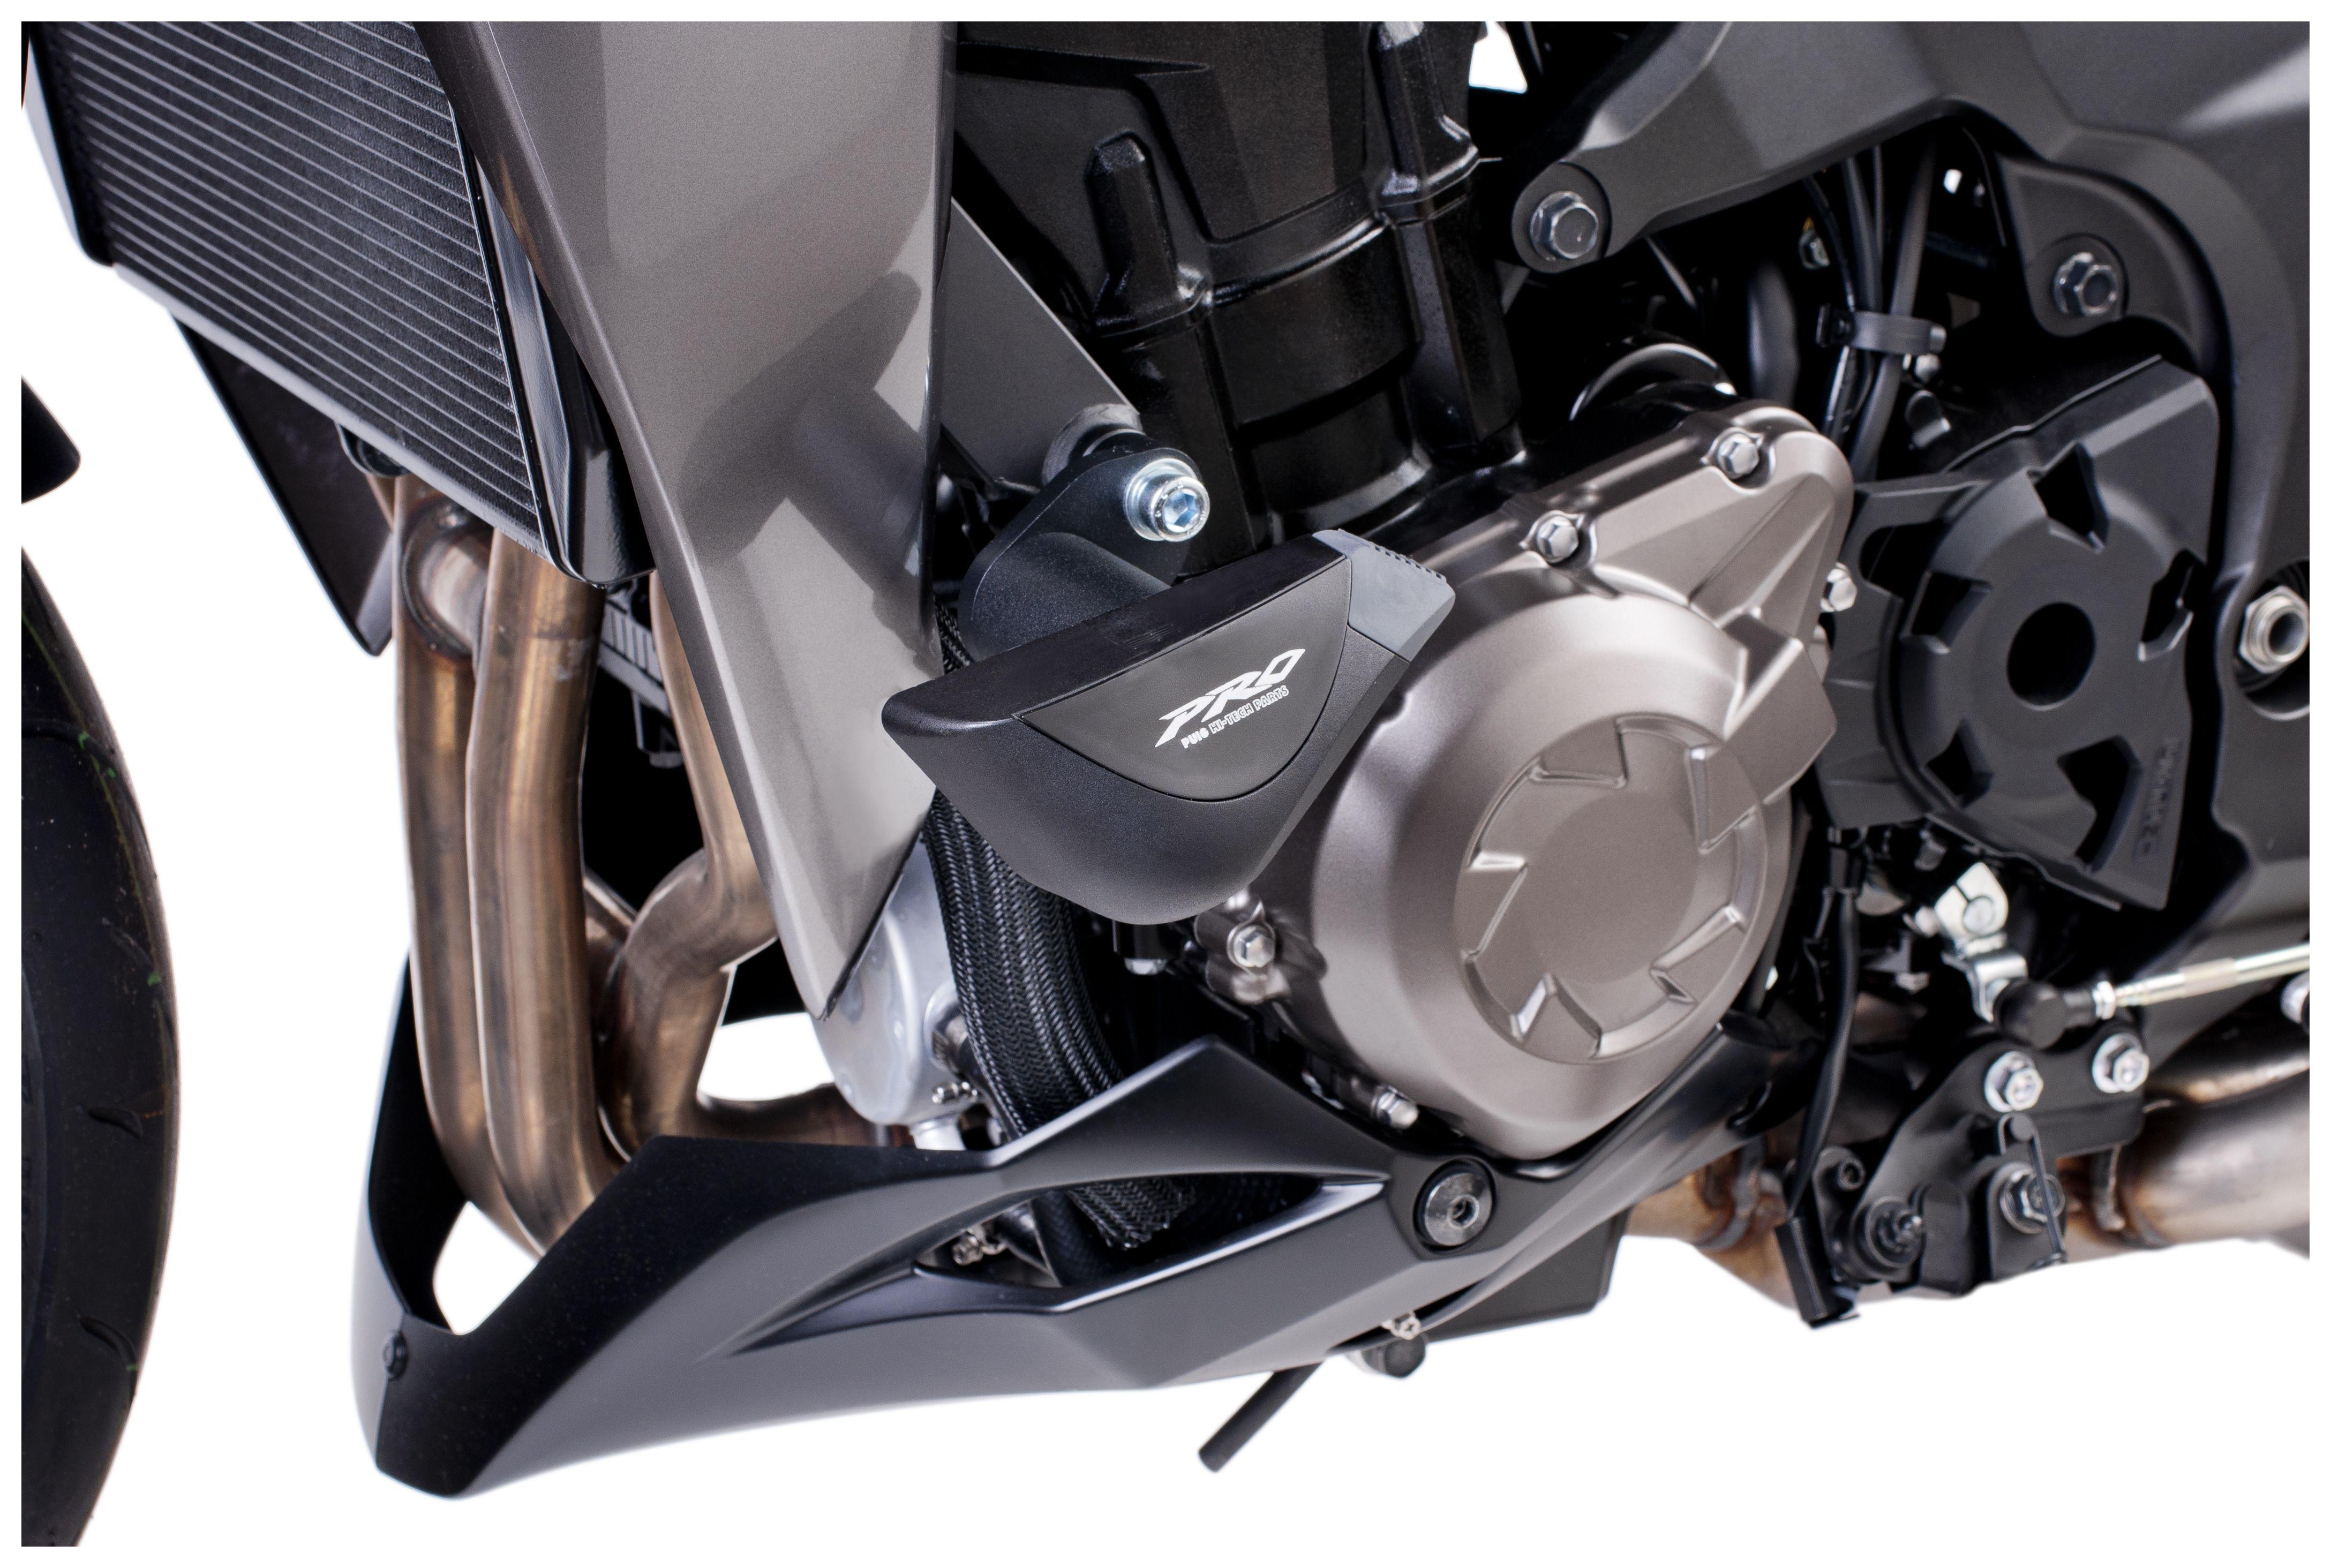 Puig Pro Frame Sliders Kawasaki Versys 1000 / Z1000 - Cycle Gear